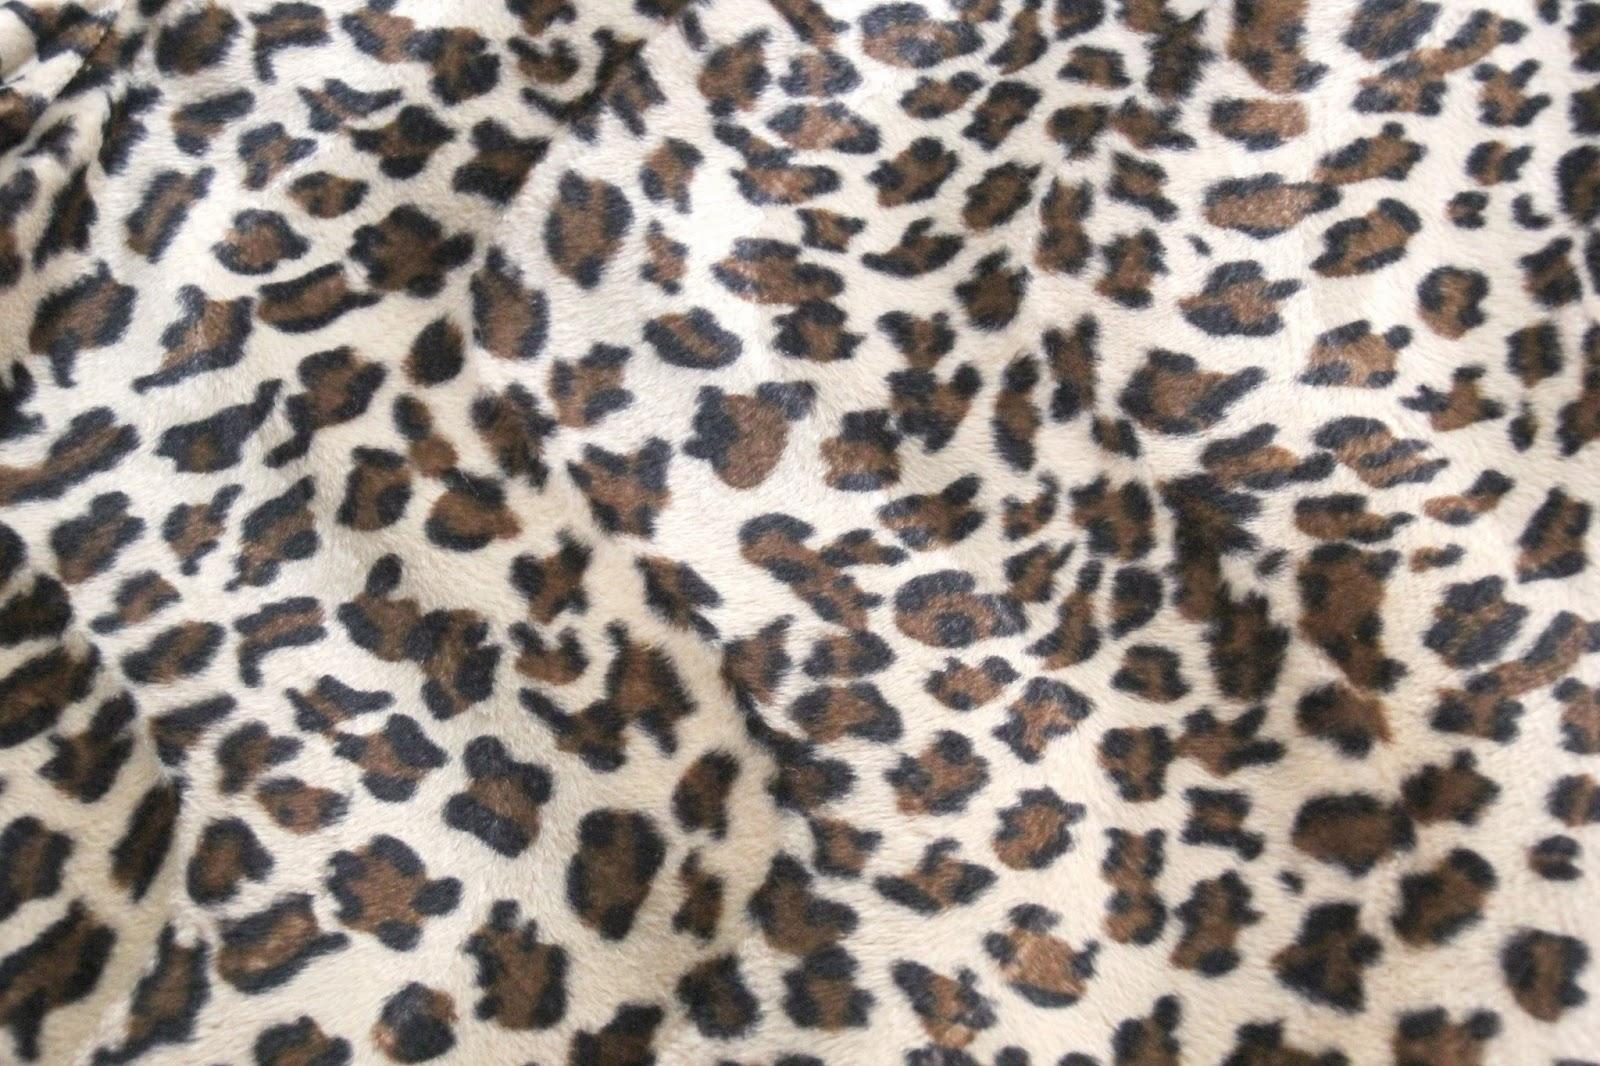 diy abrigo de pelos animal print (patrones gratis) - Handbox Craft ...